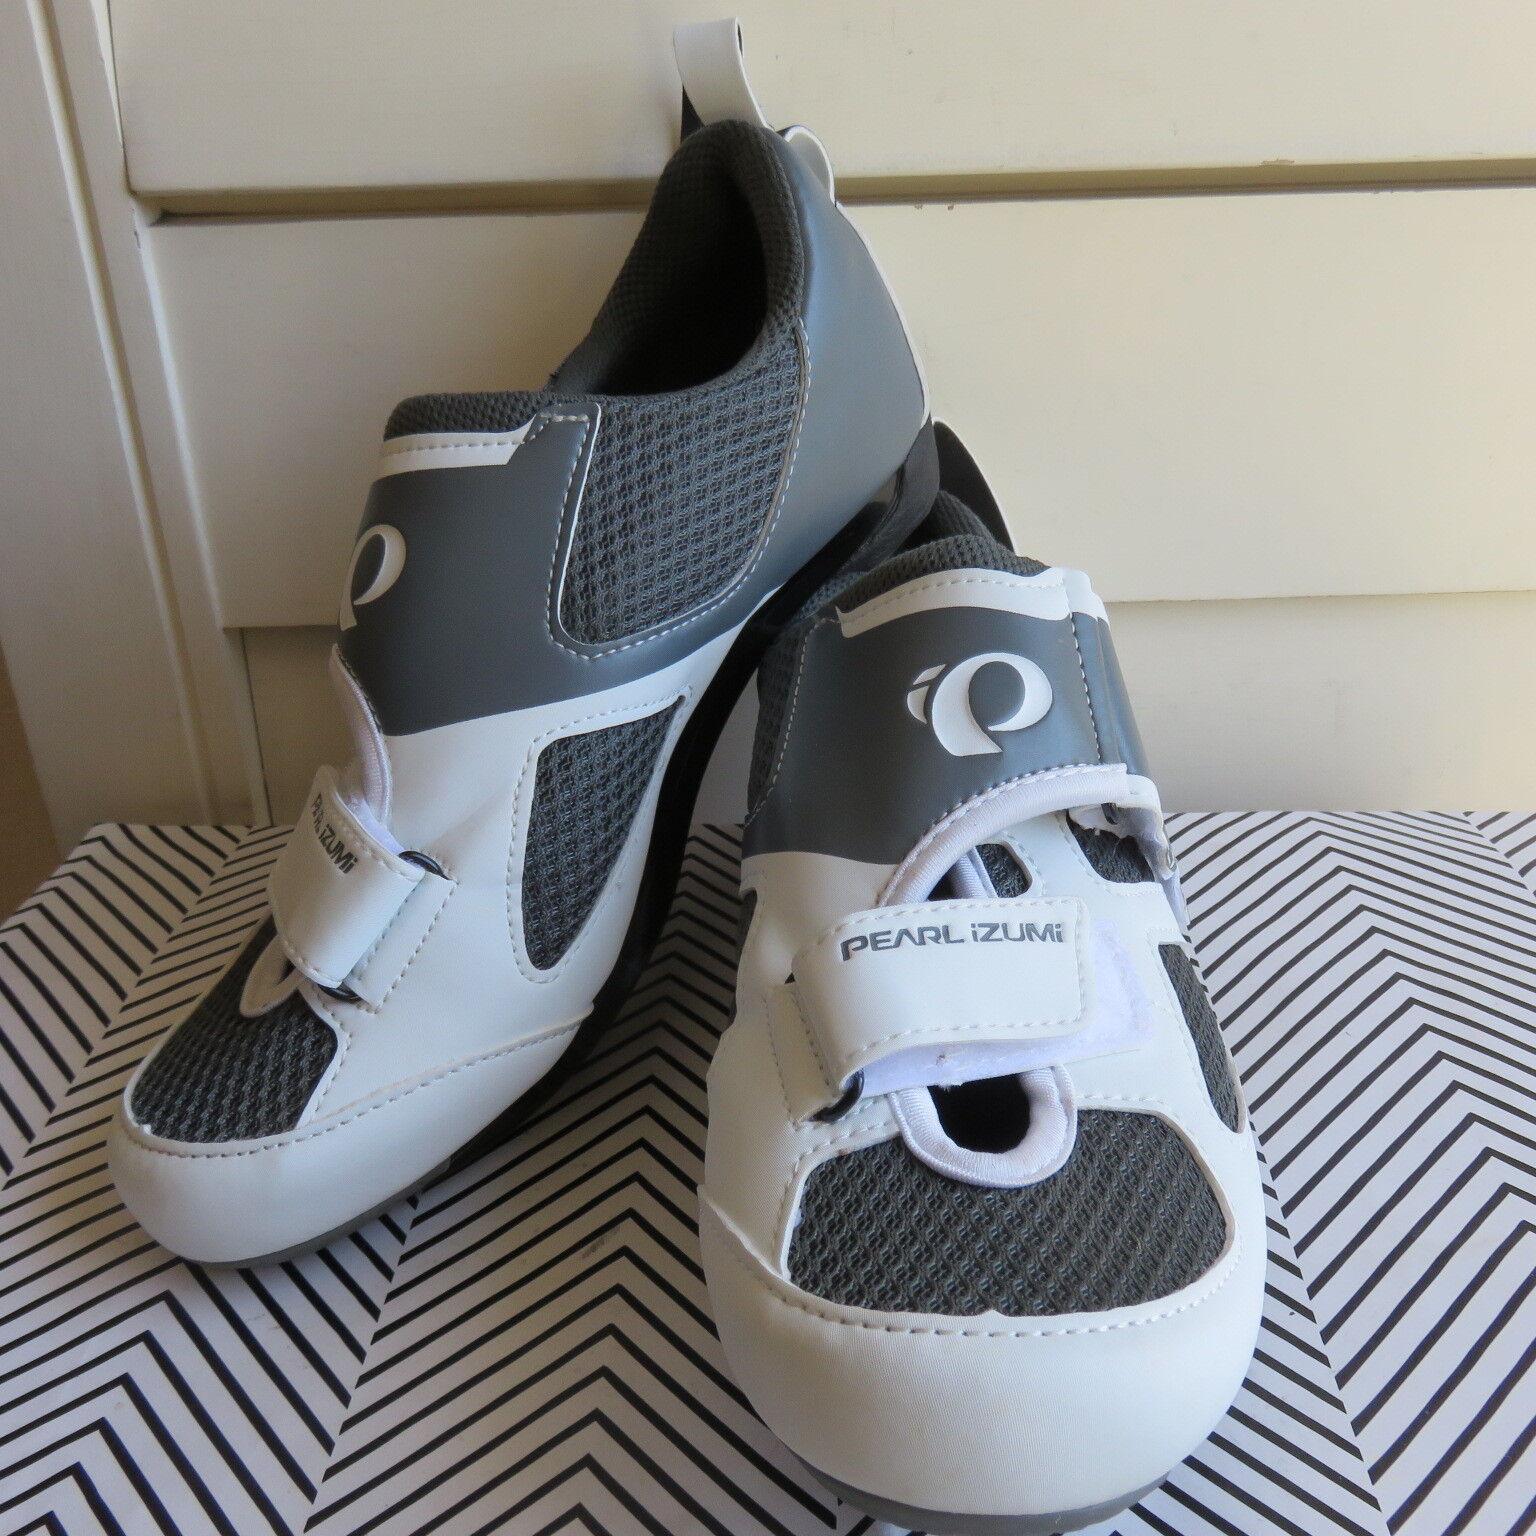 PEARL IZUMI 38.5  7.2 M Inteface W Tri Fly V Women's Cycling shoes Shimano SH51